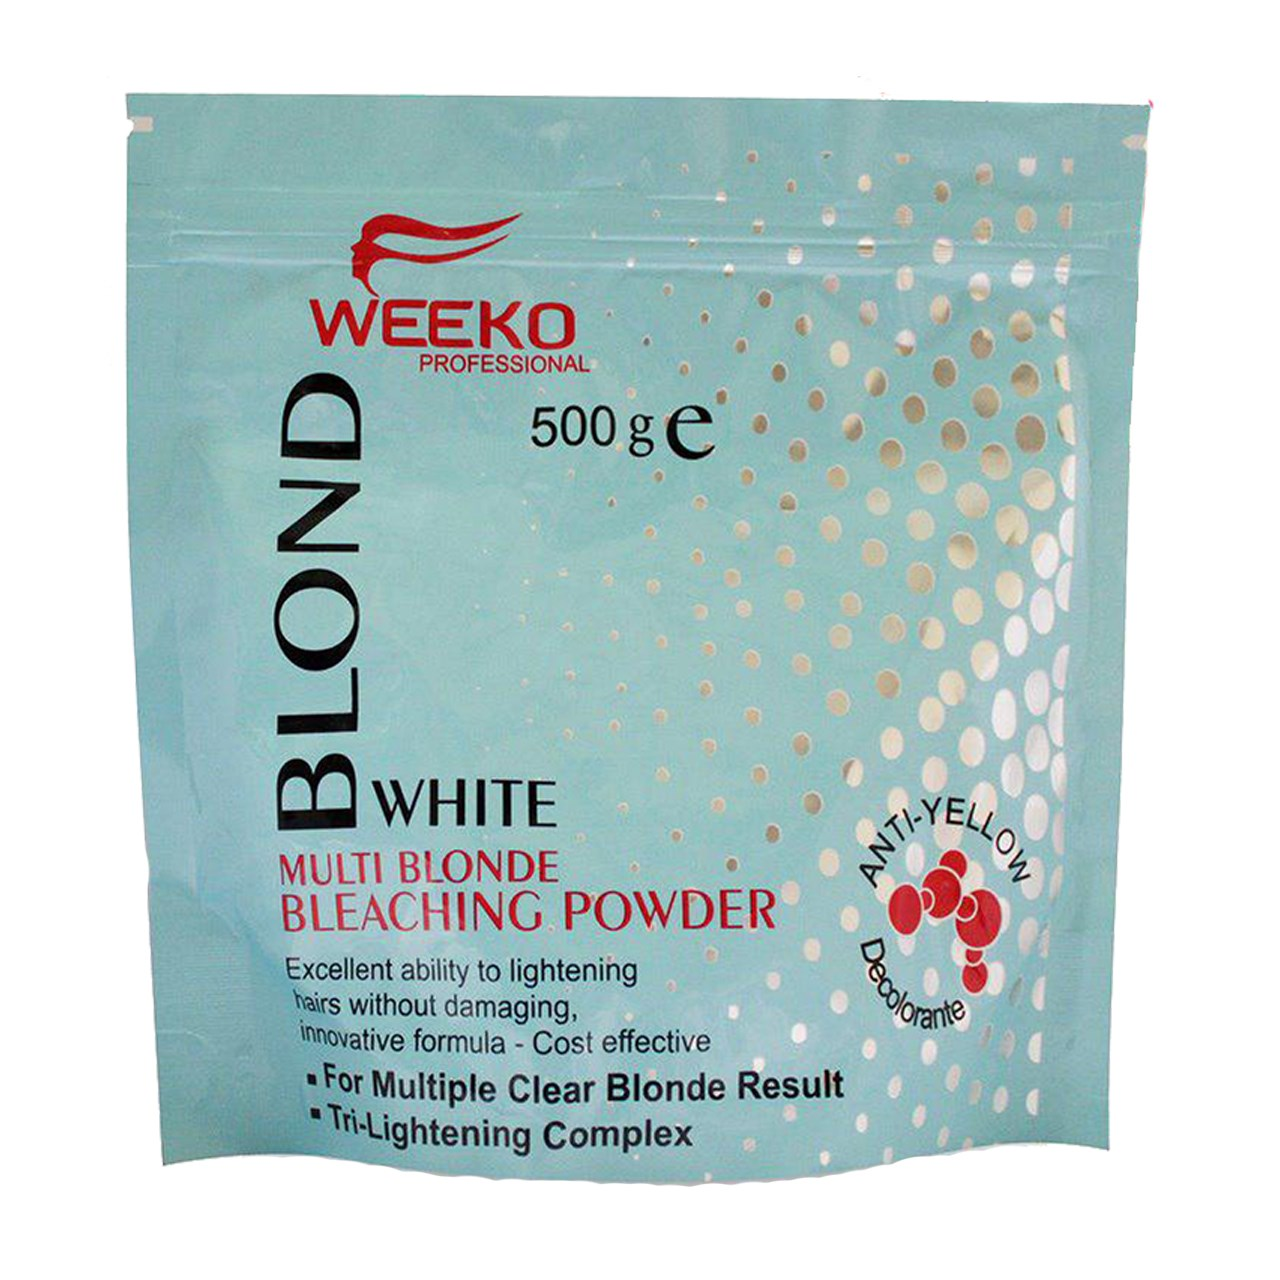 پودر دکلره ویکو مدل Blond White مقدار 500 گرم